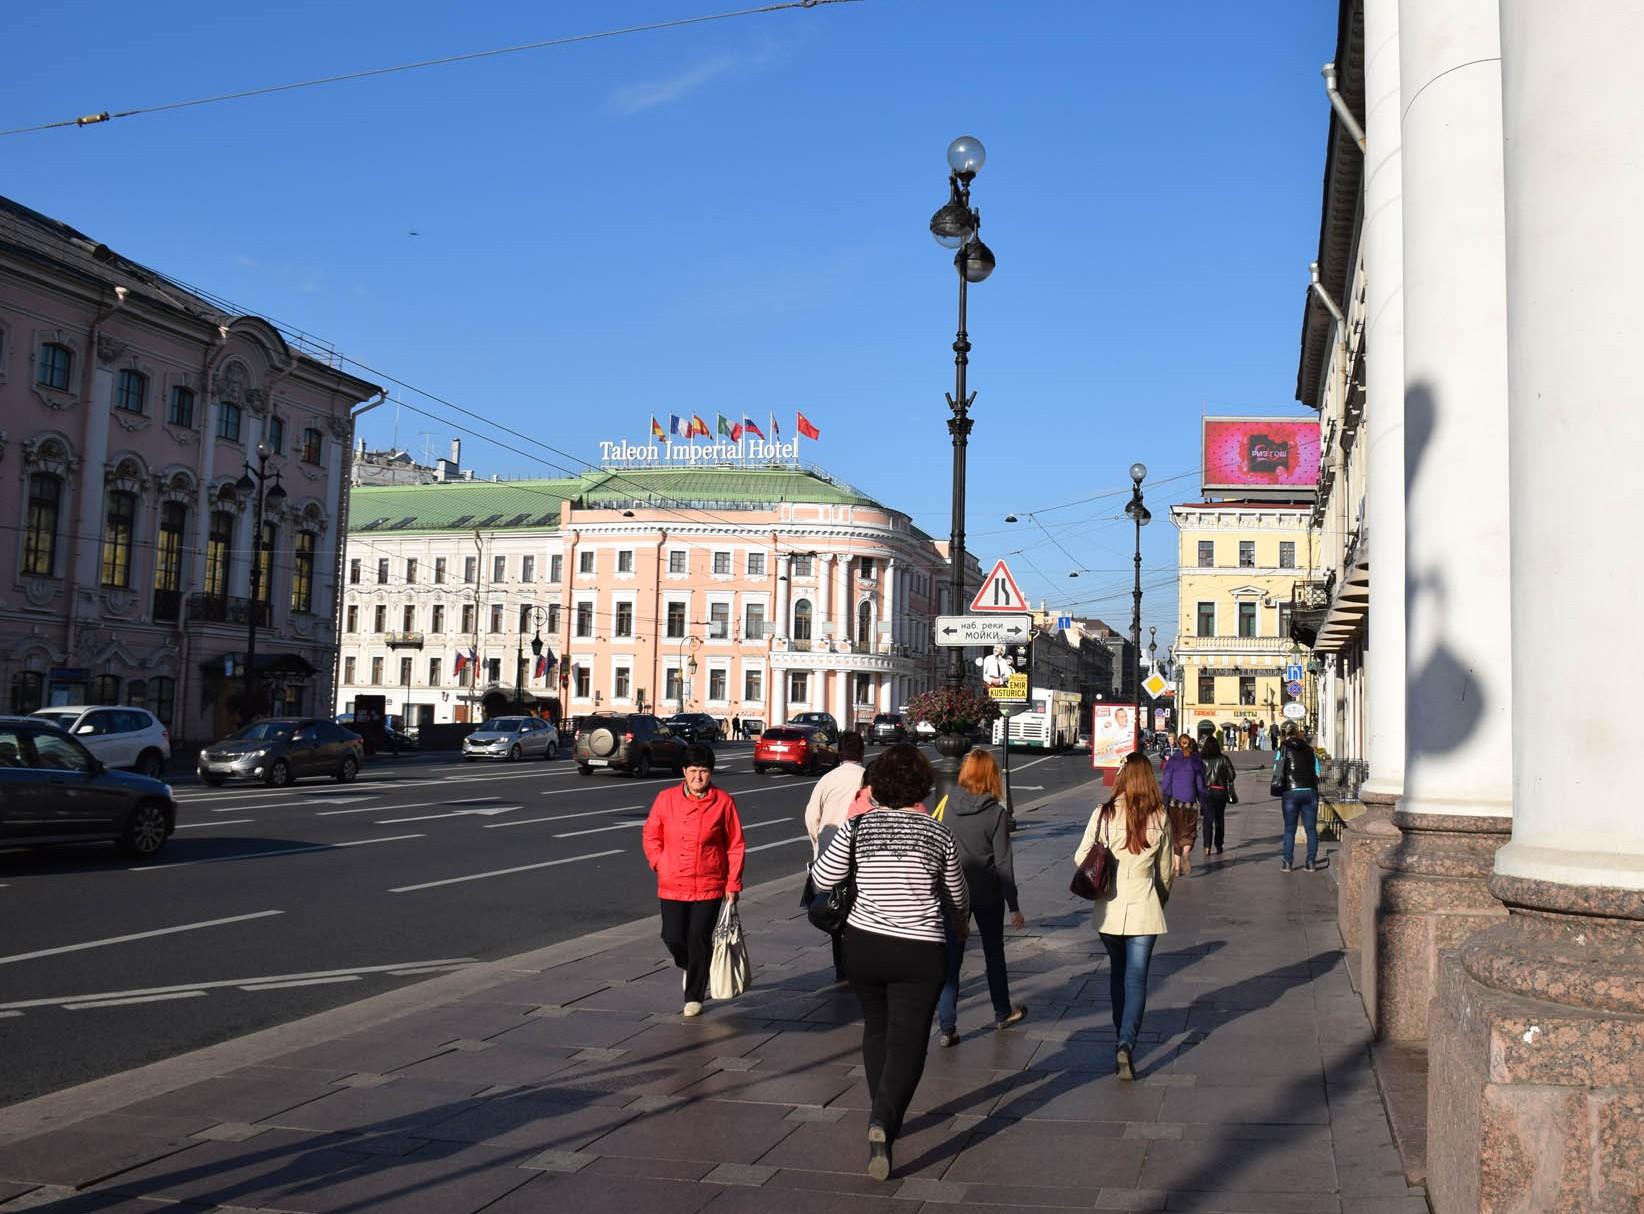 Taleon Imperial Hotel, na Nevsky Prospekt com a Moika